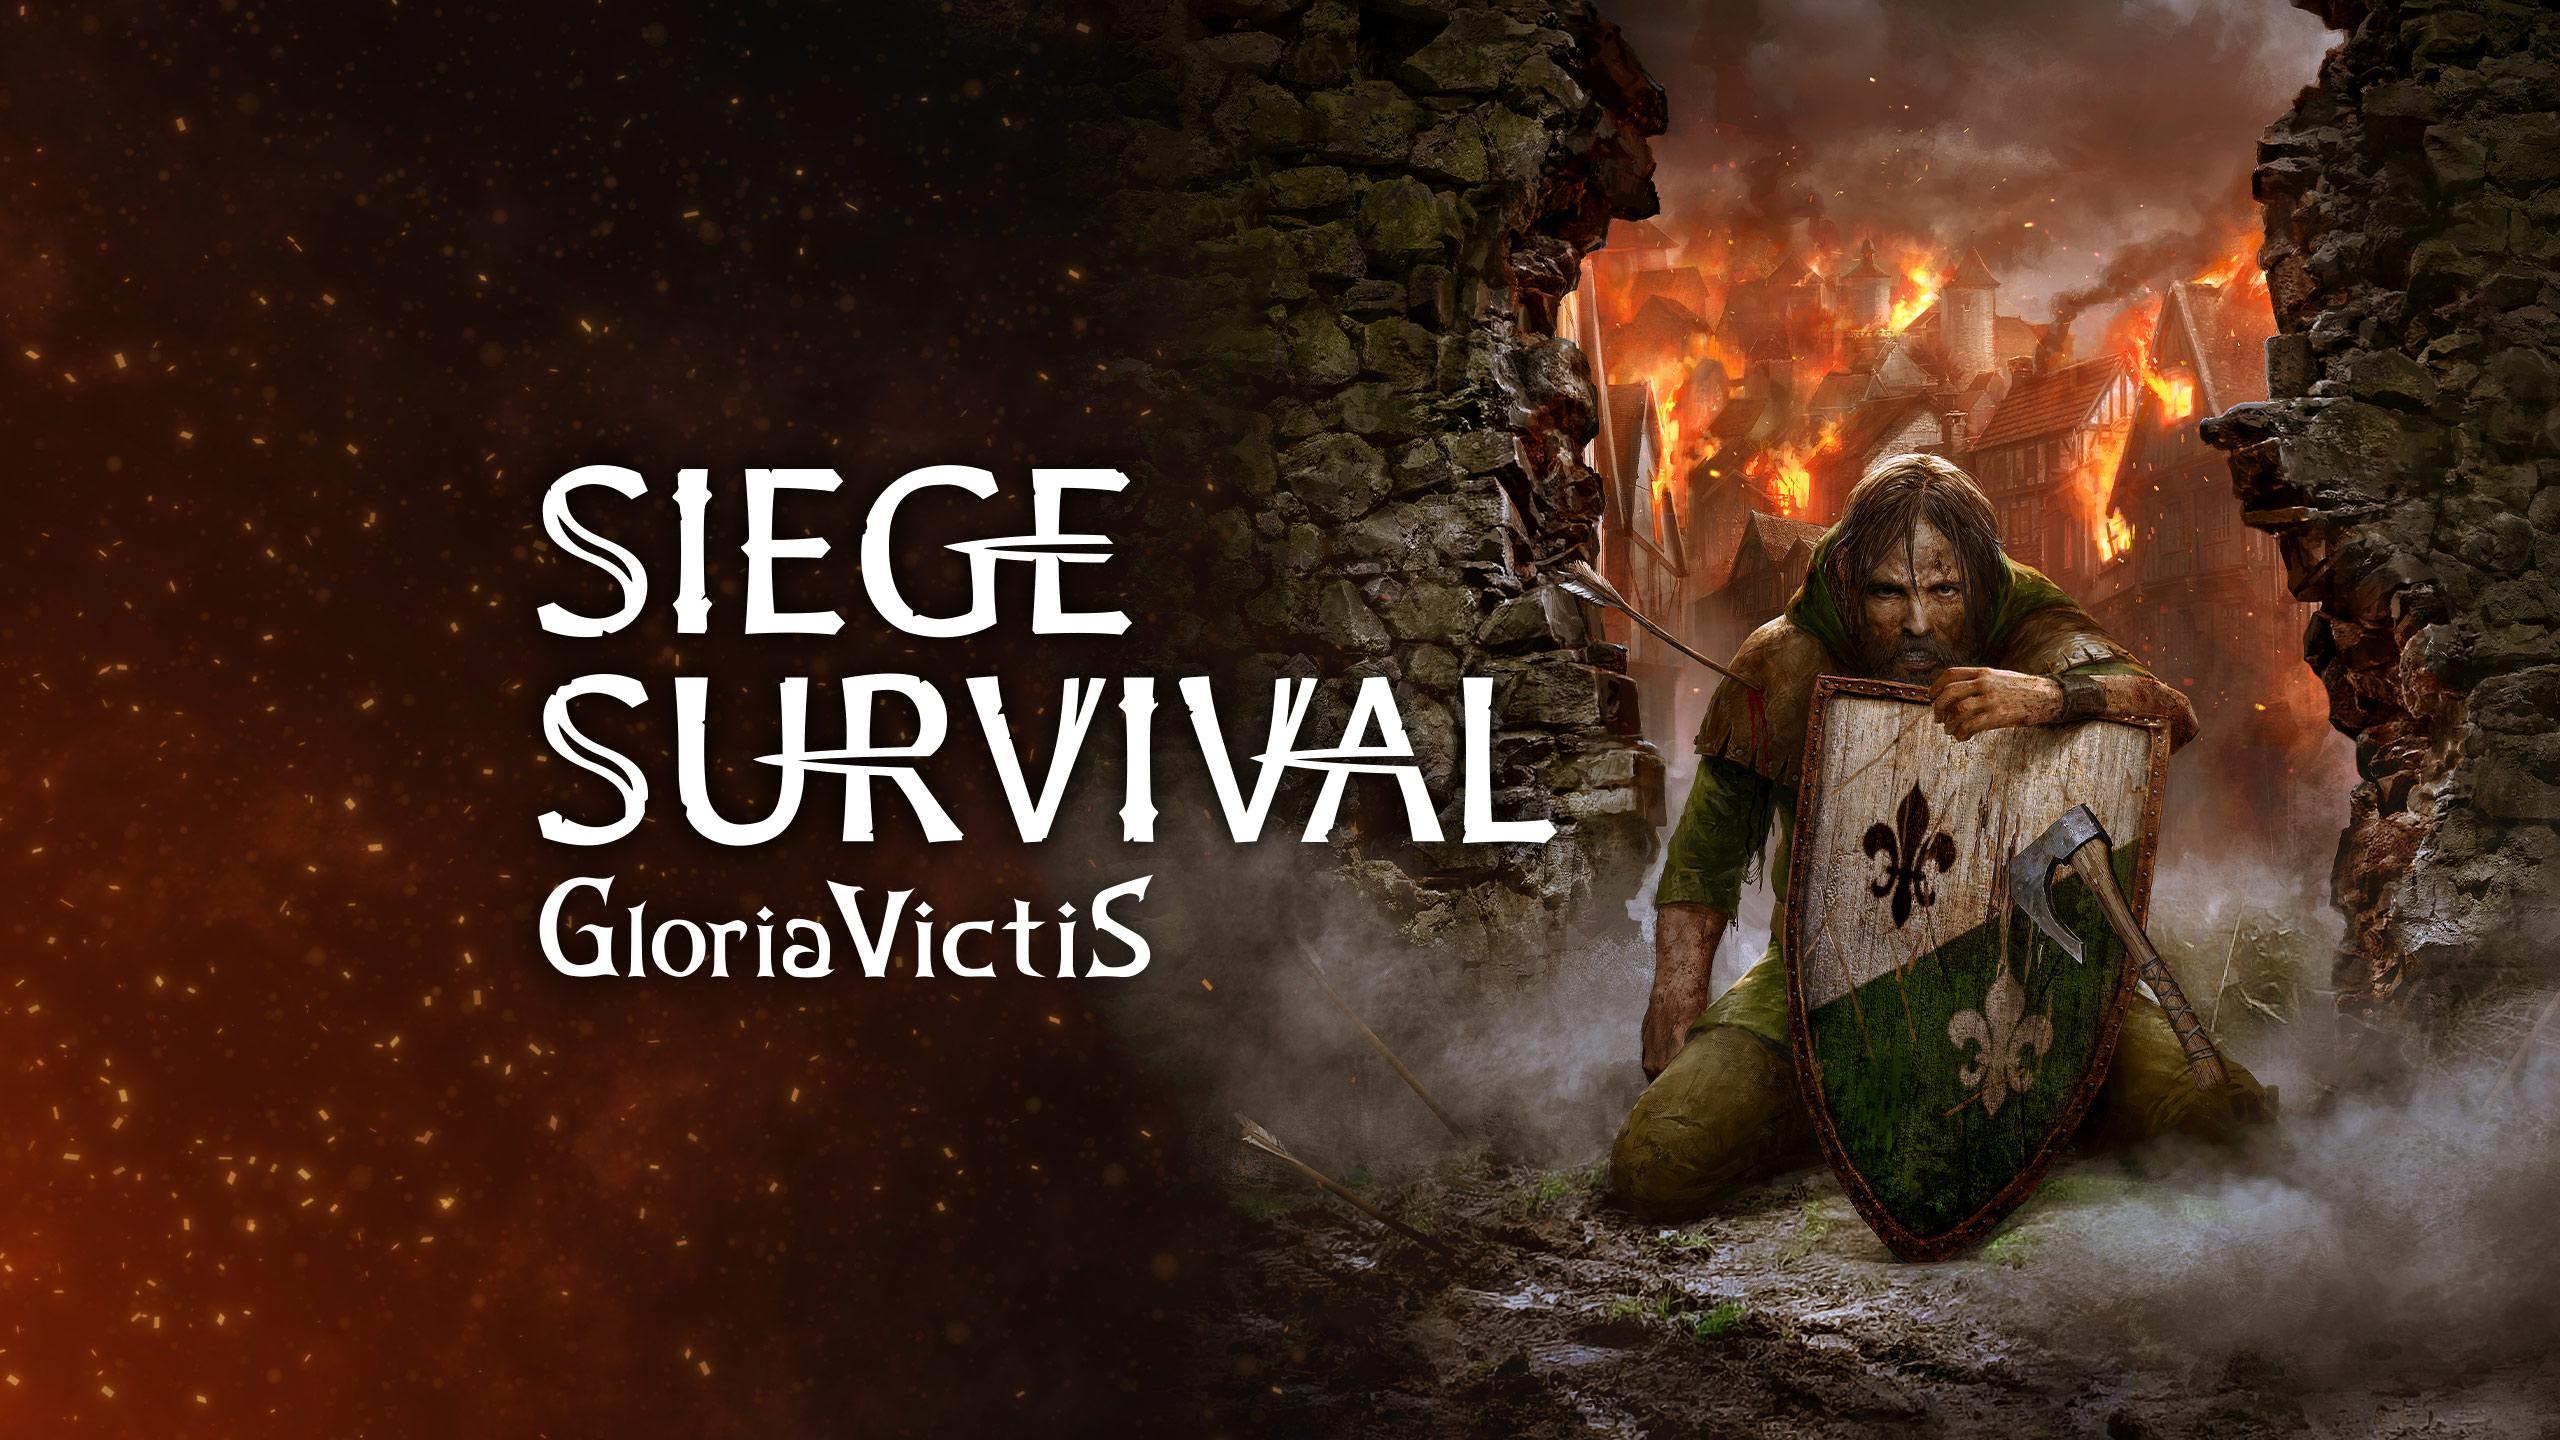 《SIEGE SURVIVAL: GLORIA VICTIS》DLC 「THE LOST CARAVAN」